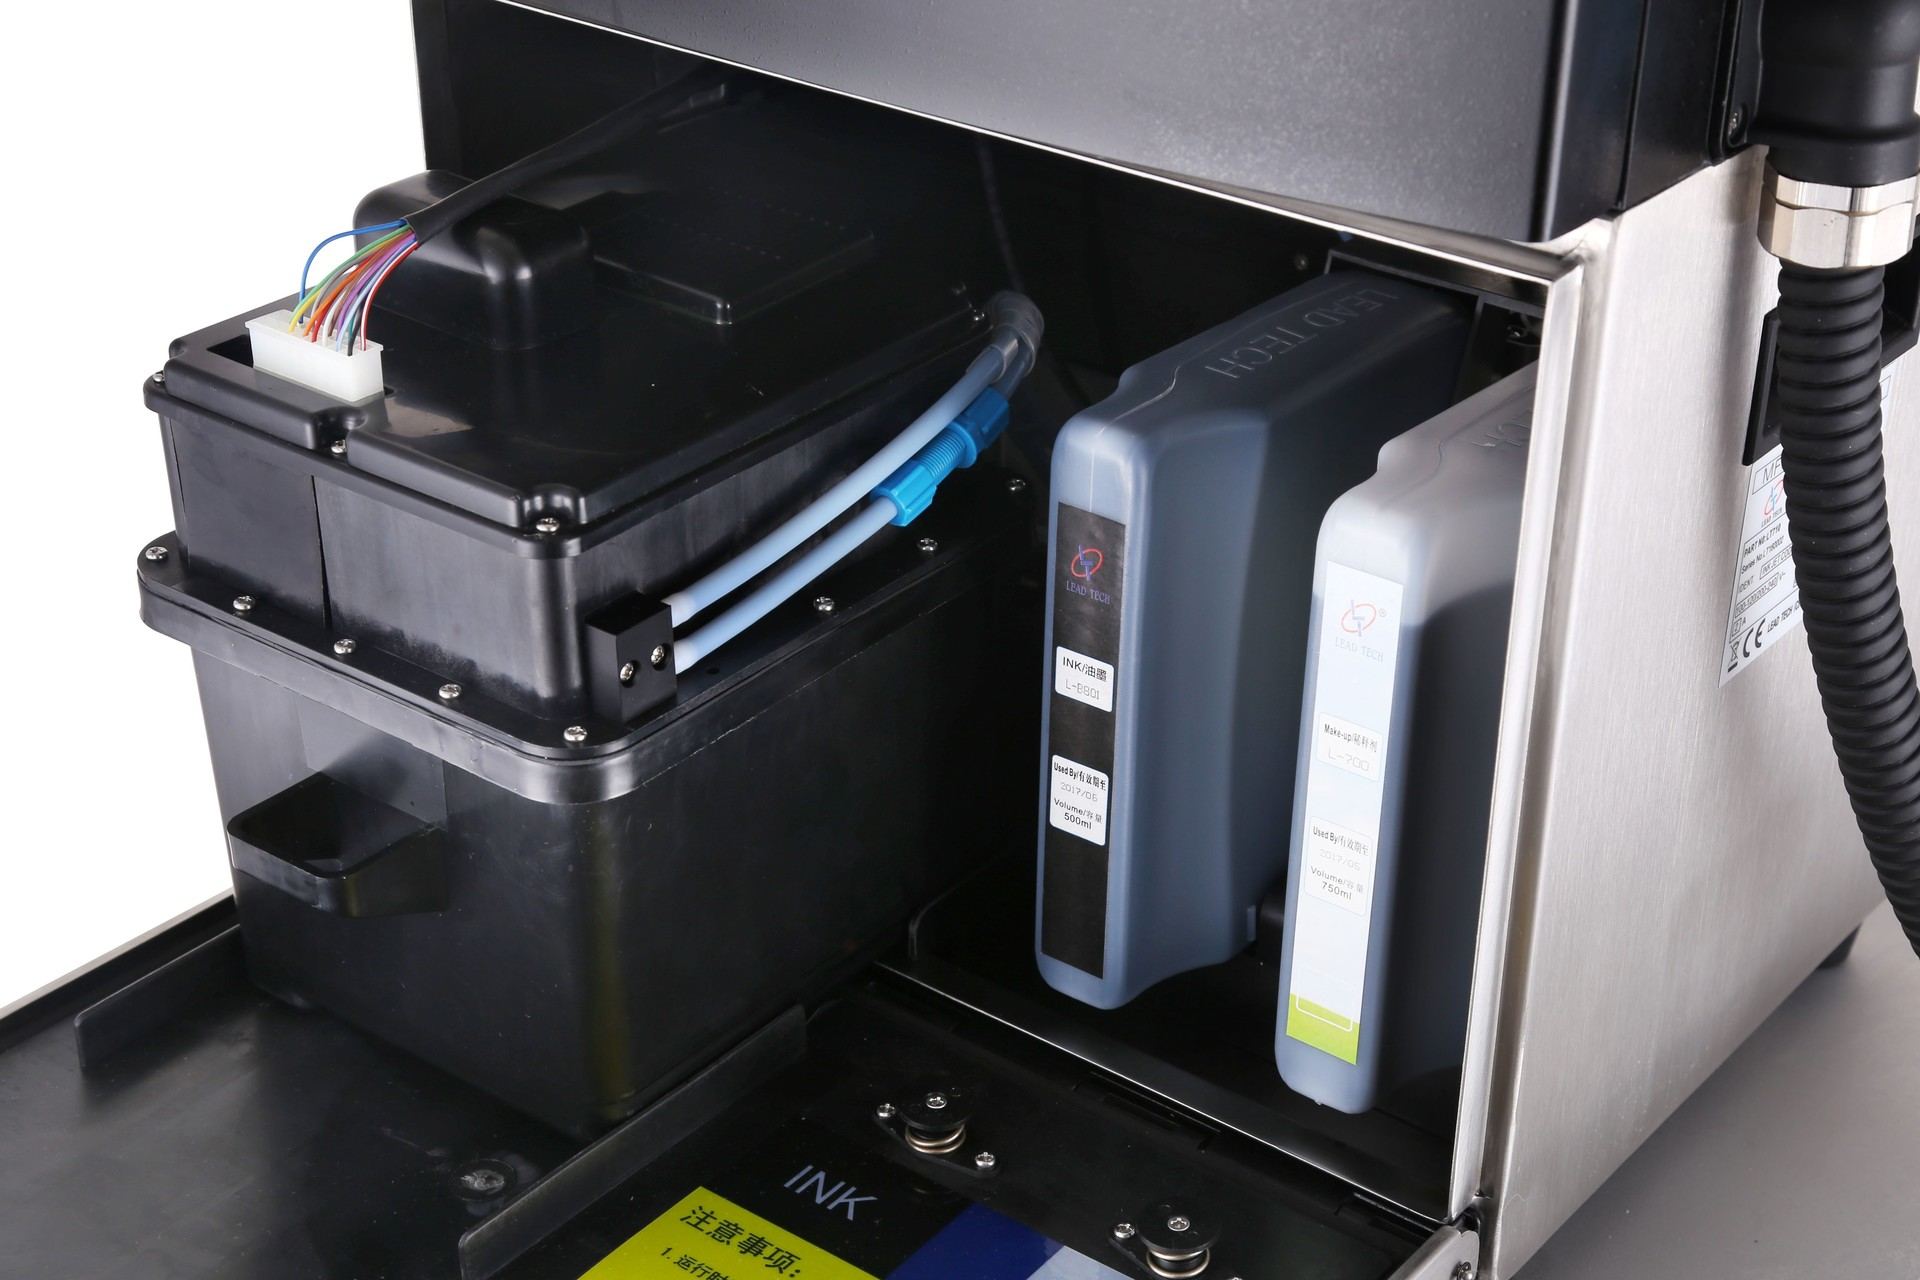 Lead Tech Cij Digital Printer for Cable Printing.